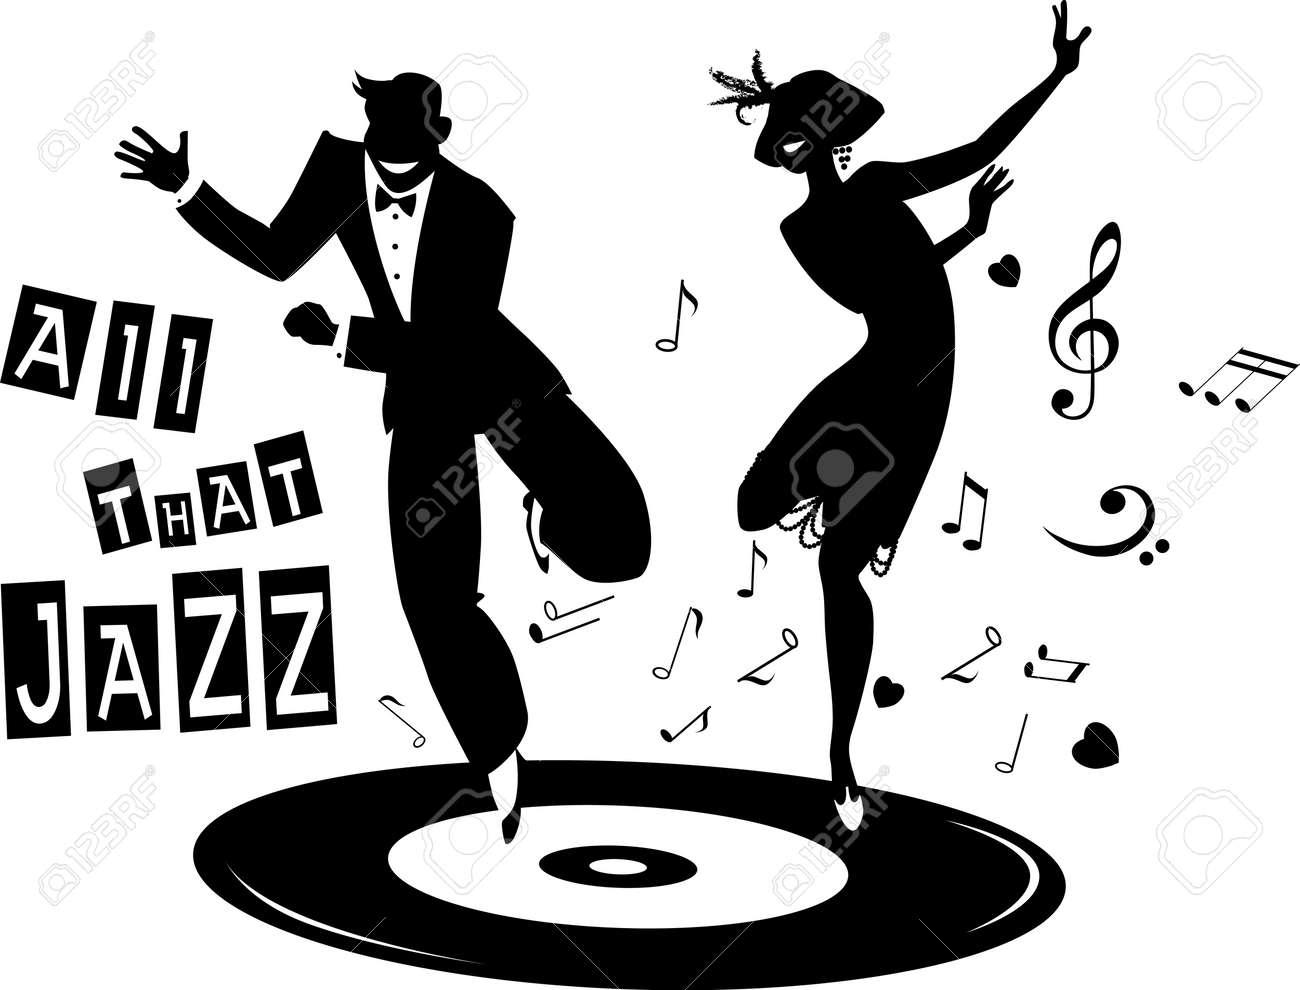 0 1920s stock vector illustration and royalty free 1920s clipart rh 123rf com Roaring Twenties Clip Art 1920s art deco free clip art